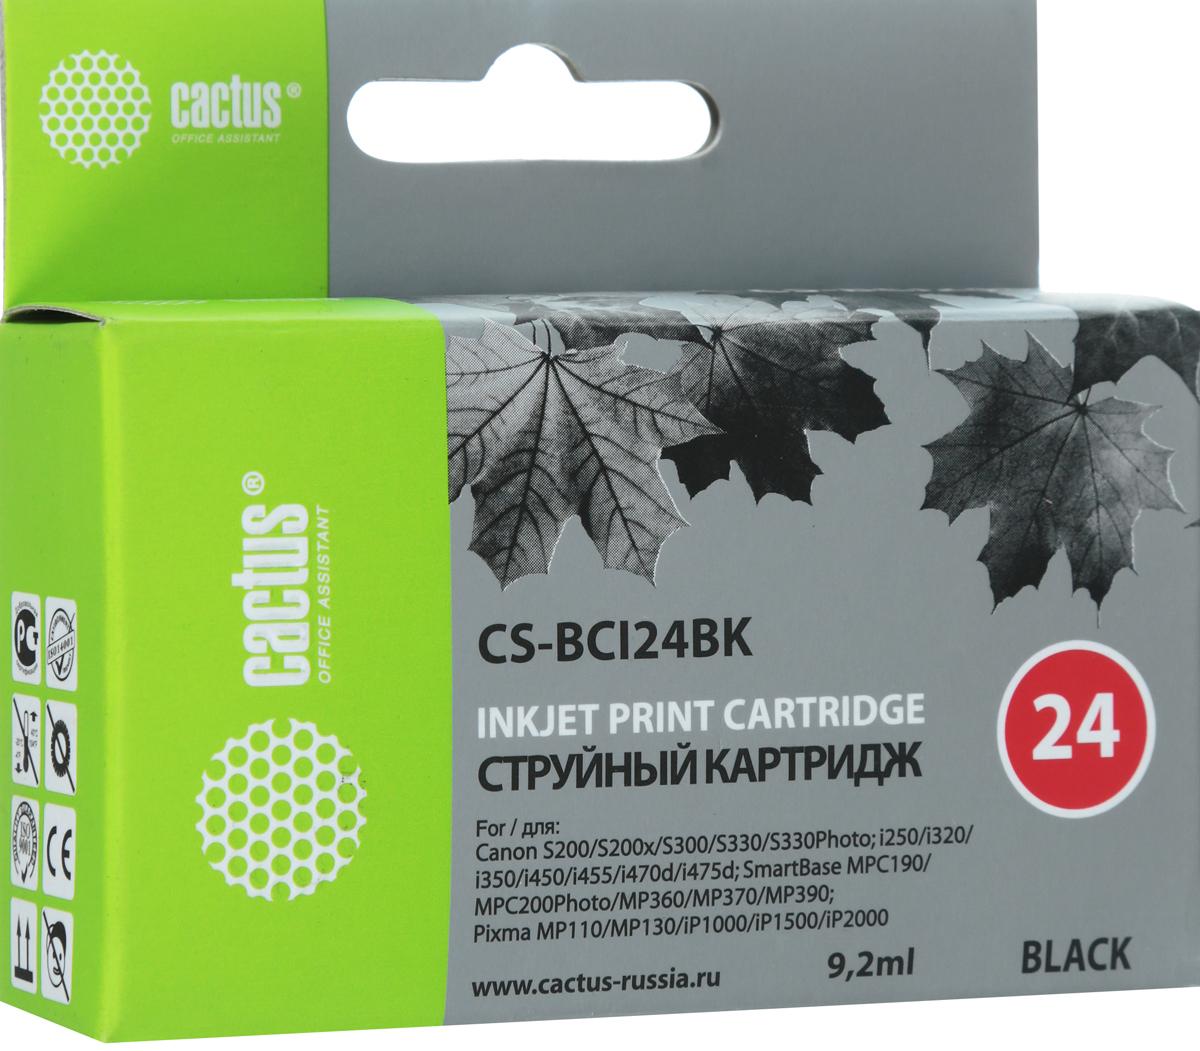 Cactus CS-BCI24BK, Black струйный картридж для Canon S200/ S200x/ S300/ S330/ S330 Photo; i250/ i320 картридж cactus cs bci24bk для canon s200 s200x s300 s330 s330 photo i250 i320 i350 i450 i455 i470d i475d mp110 mp130 mp360 mp370 mp3